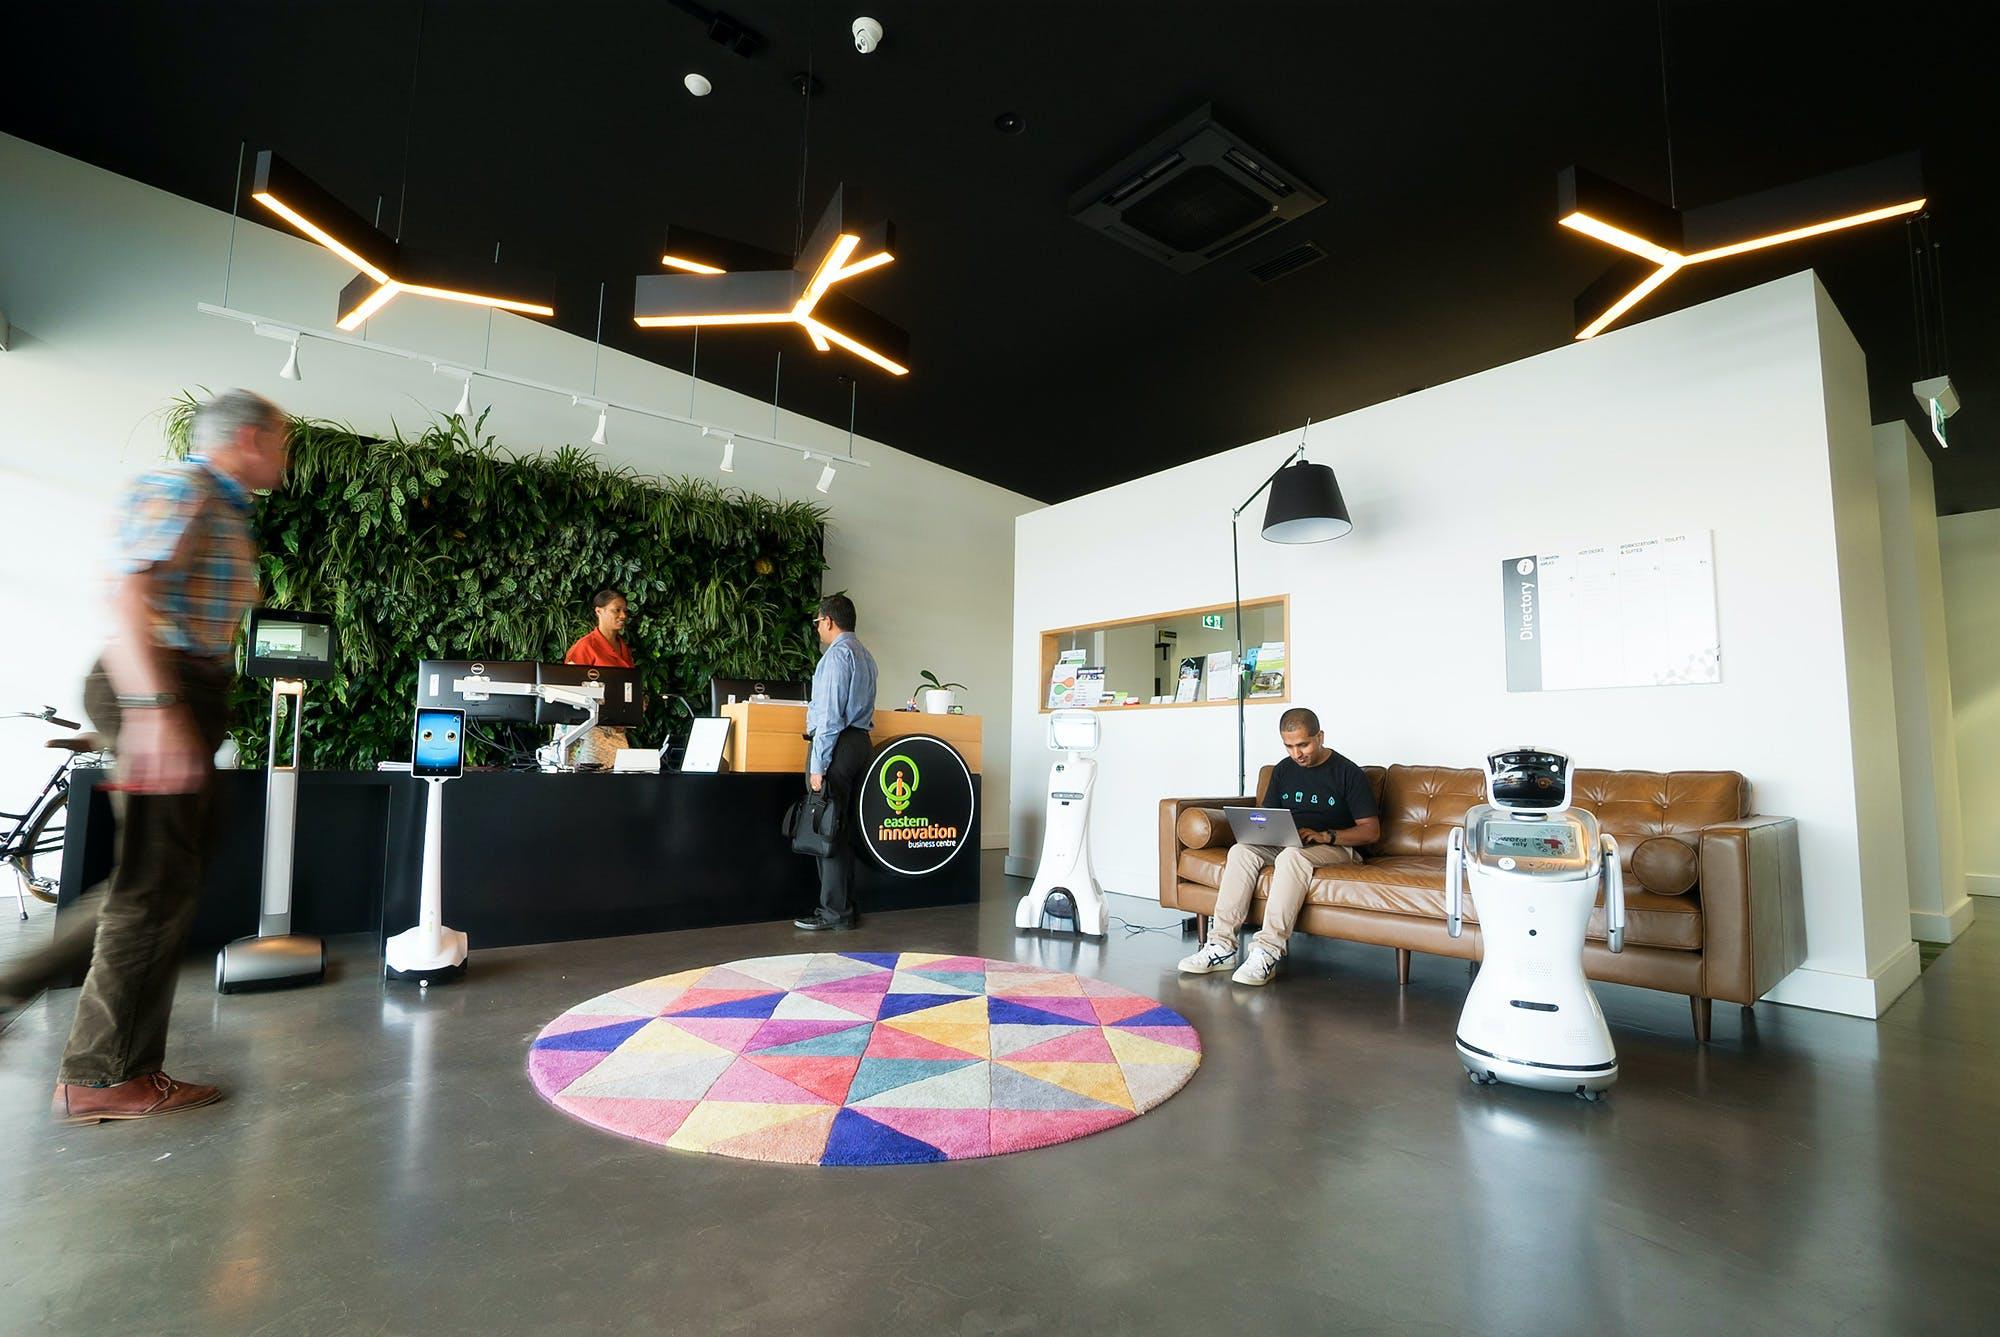 Training Room Single, training room at Eastern Innovation Business Centre, image 4